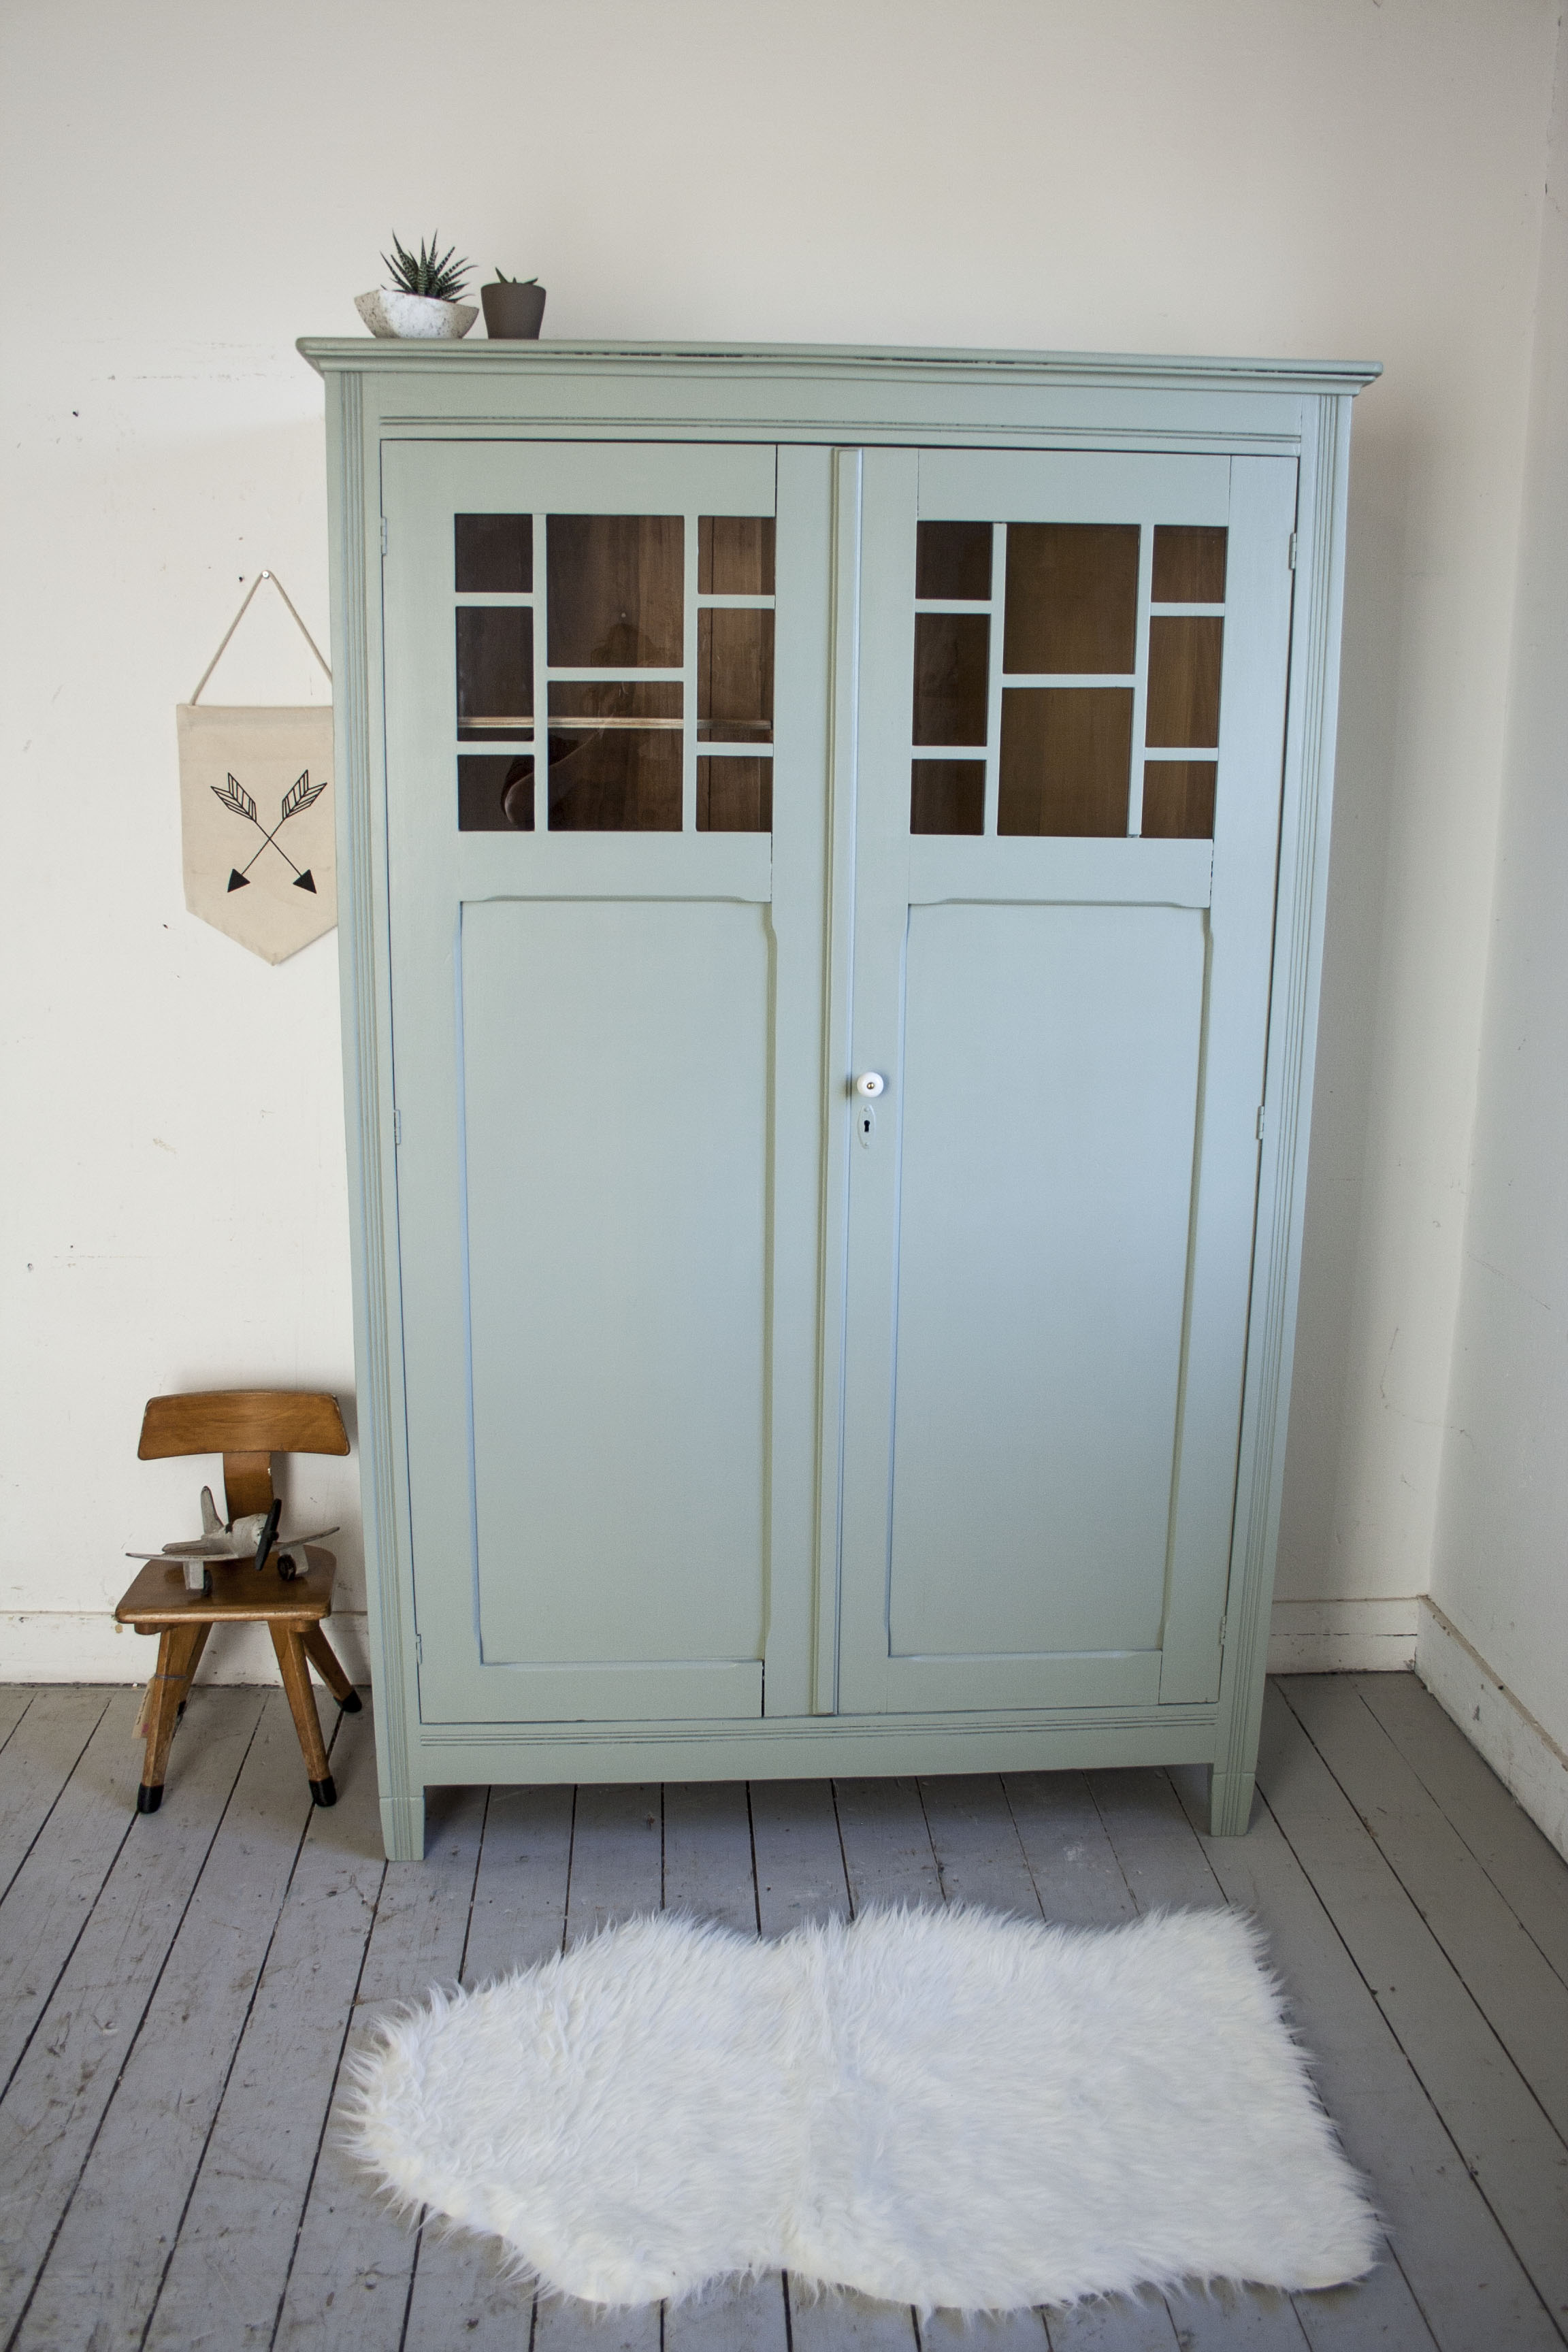 Grijsgroene kledingkast met ruitjes - Firma Zoethout_1.jpg